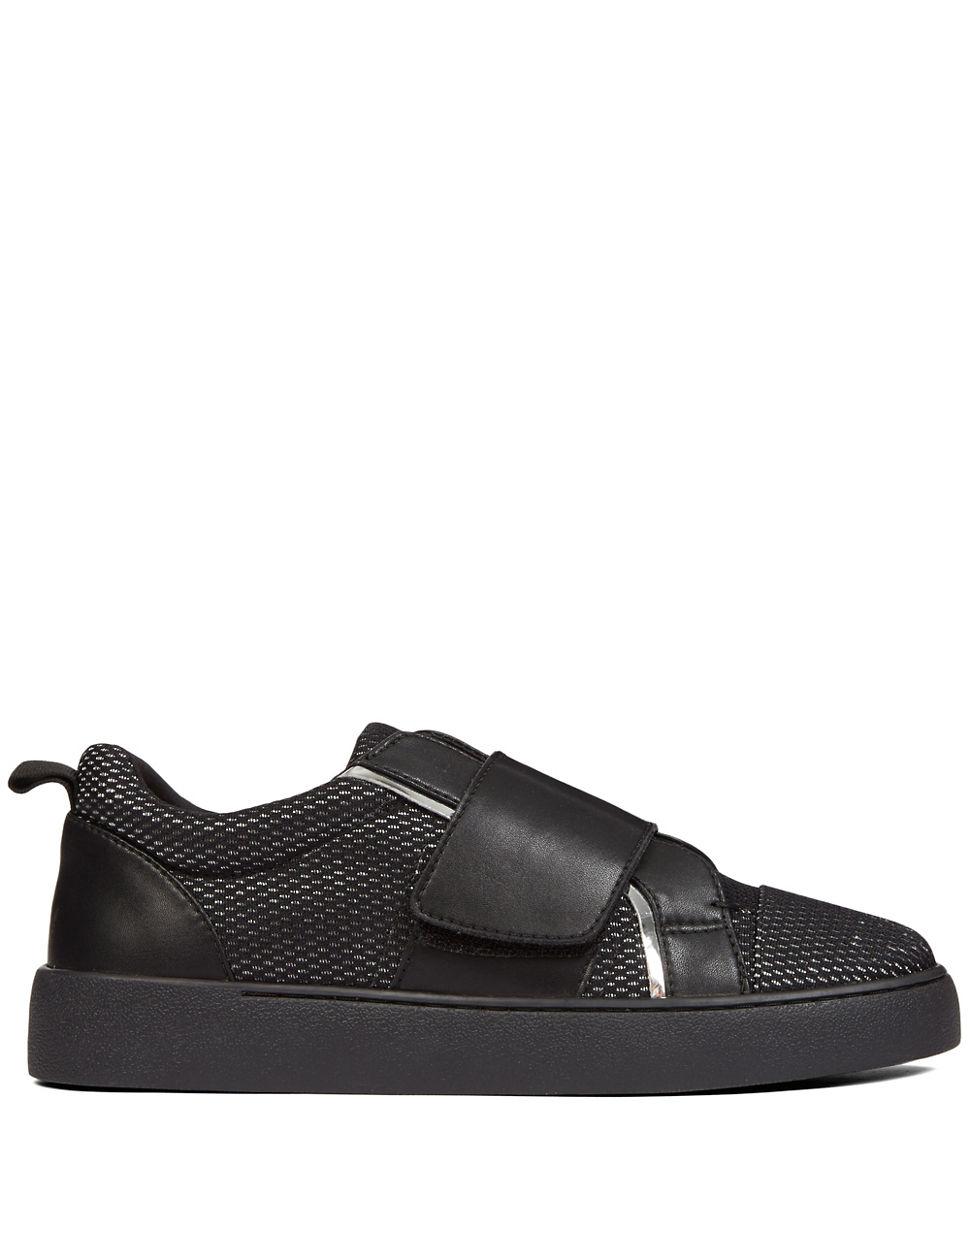 nine west leather slip on sneakers in black lyst